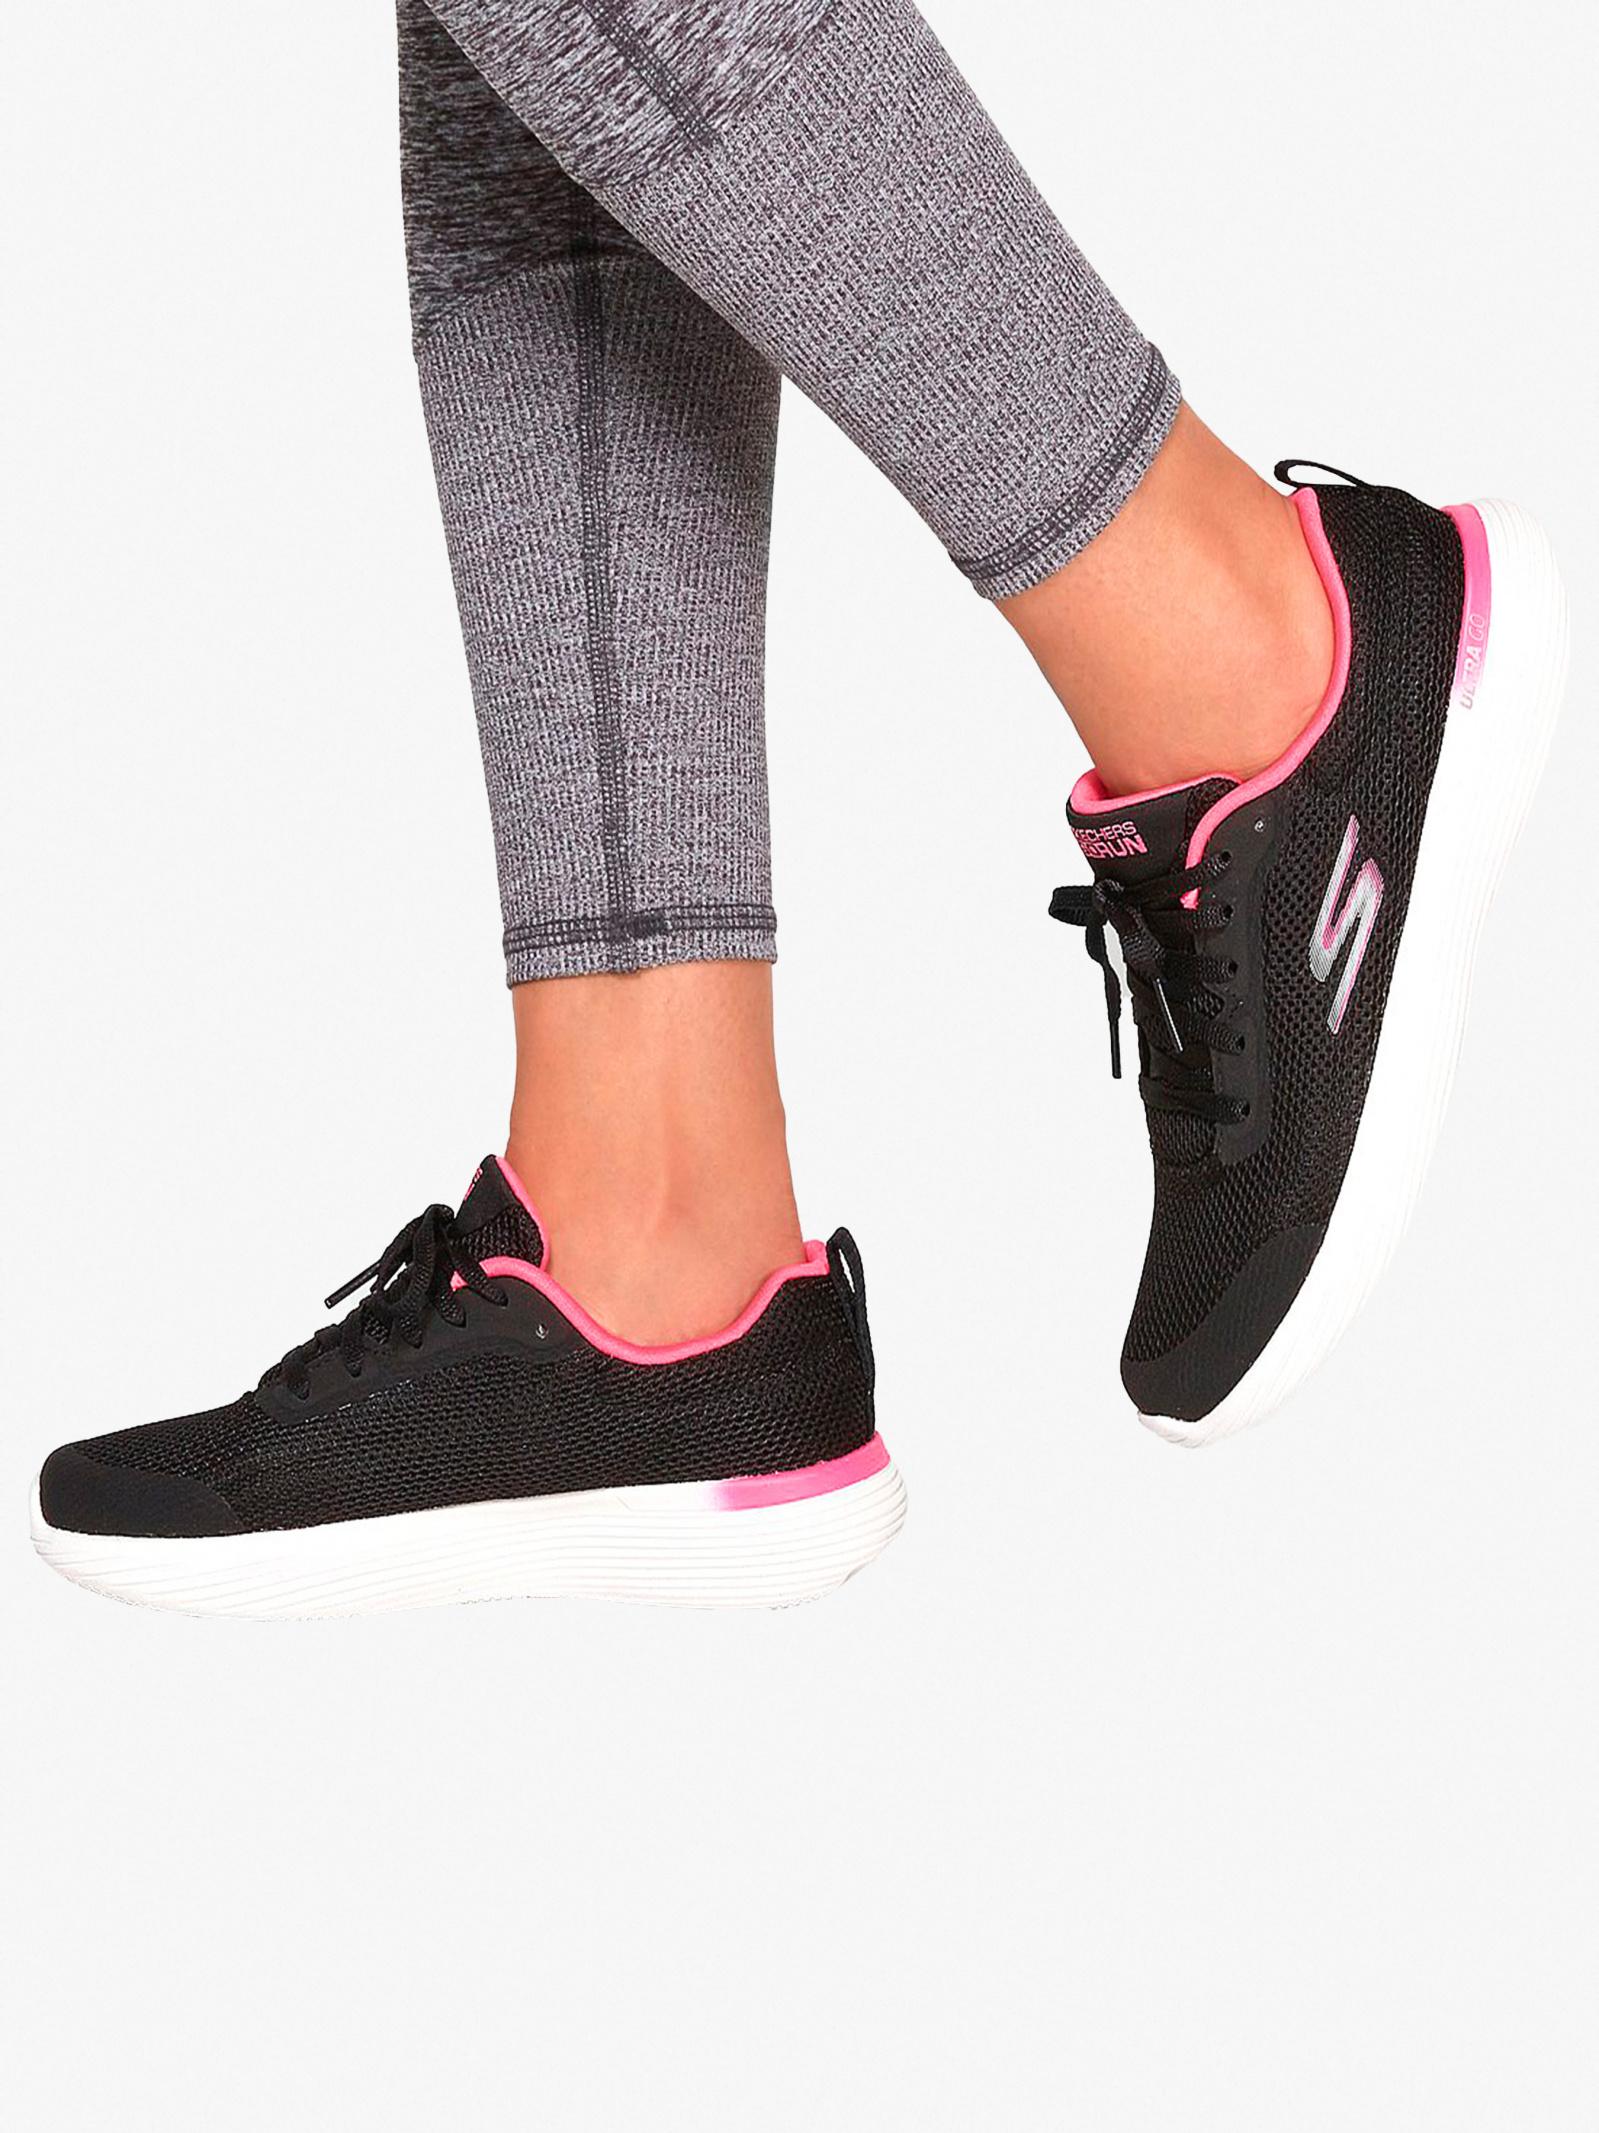 Кроссовки для женщин Skechers Performance 128000 BKPK продажа, 2017